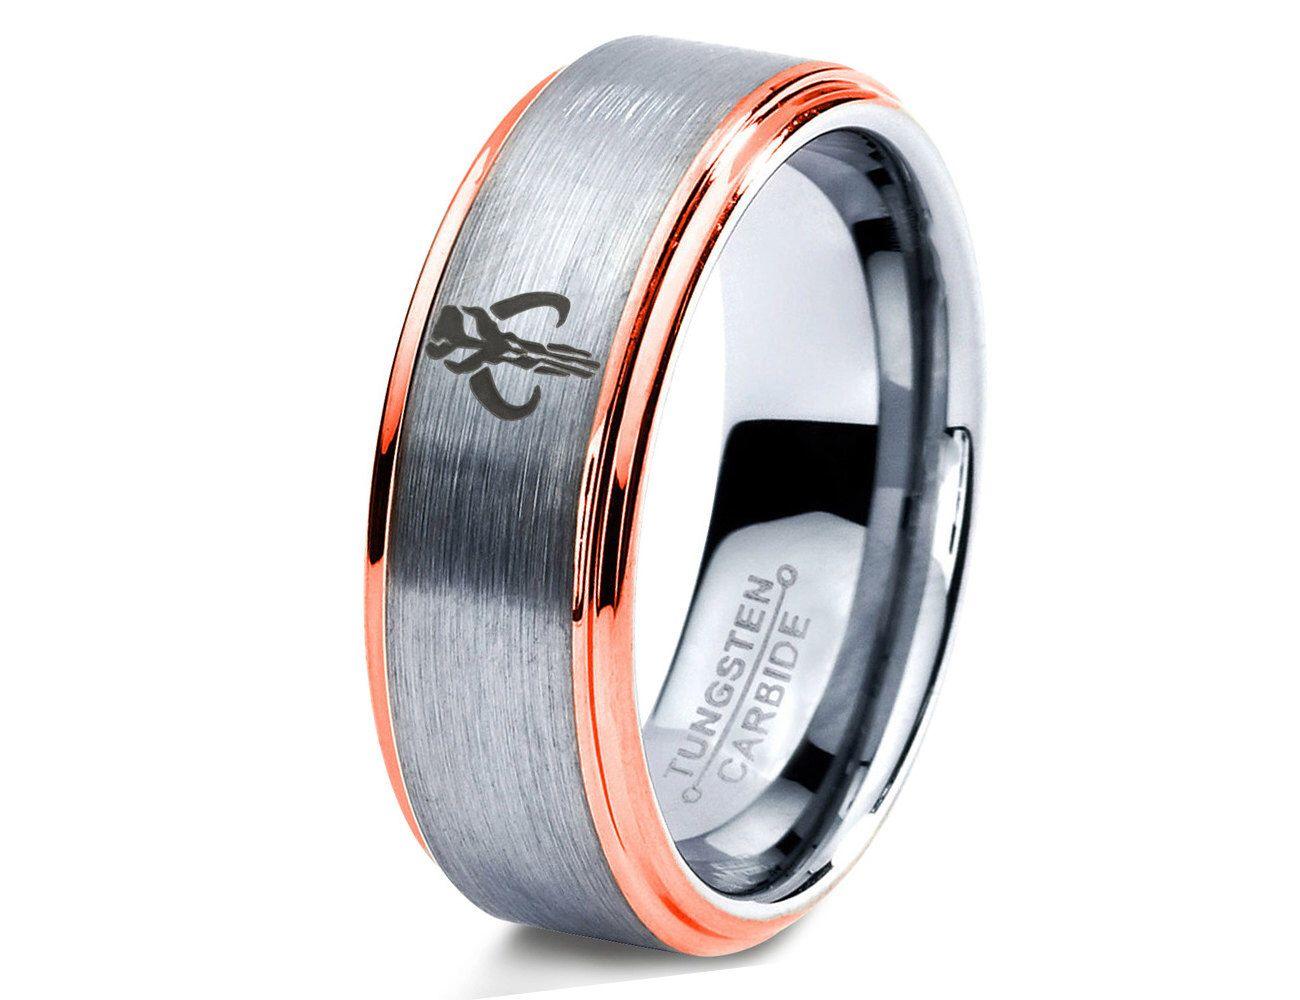 Star Wars Ring Boba Fett Mandalorian Mythosaur Skull Star Wars Mens Ring Fanatic Geek Sci Fi Boys Girls Womens Star Wars Ring Wedding Ring Bands Rings For Men